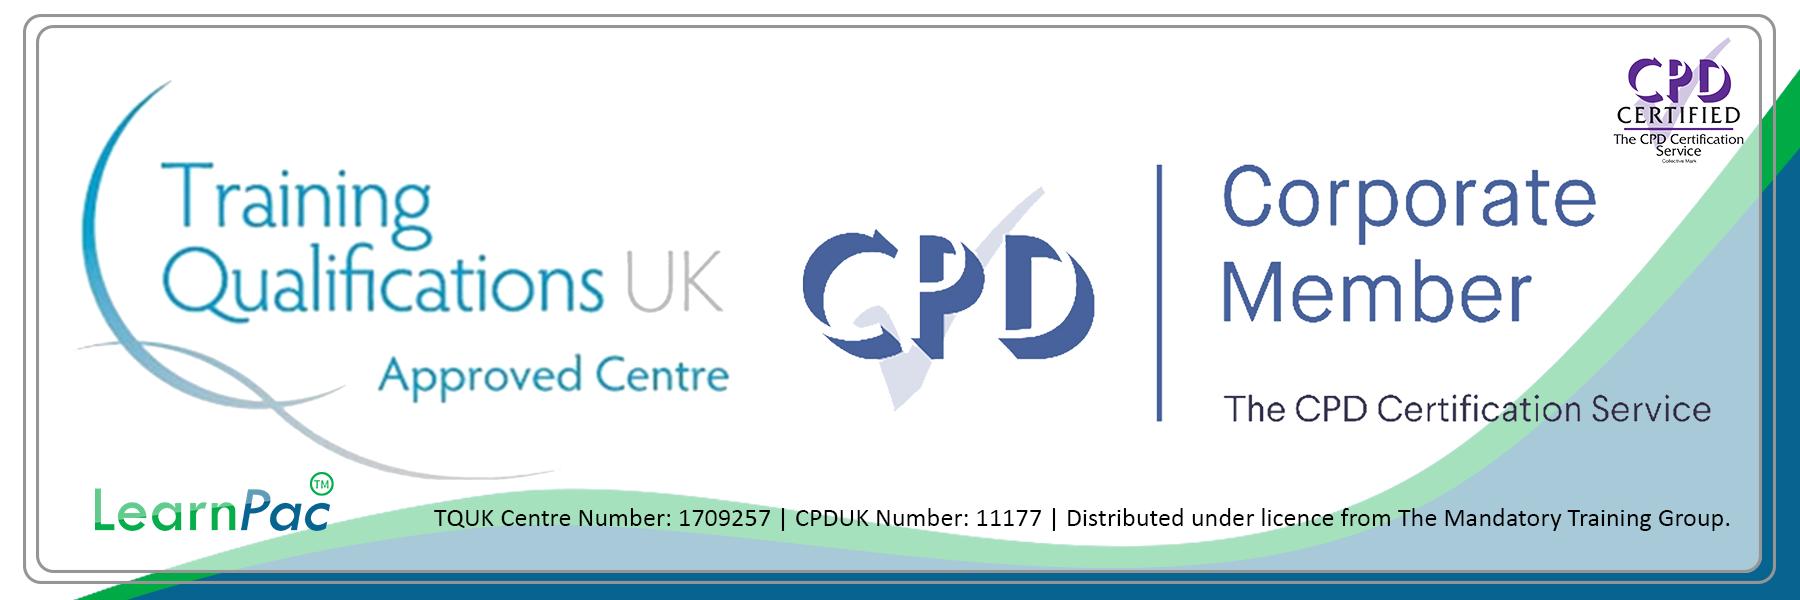 TQUK Banner - CPDUK Accredited - Learnpac System UK -